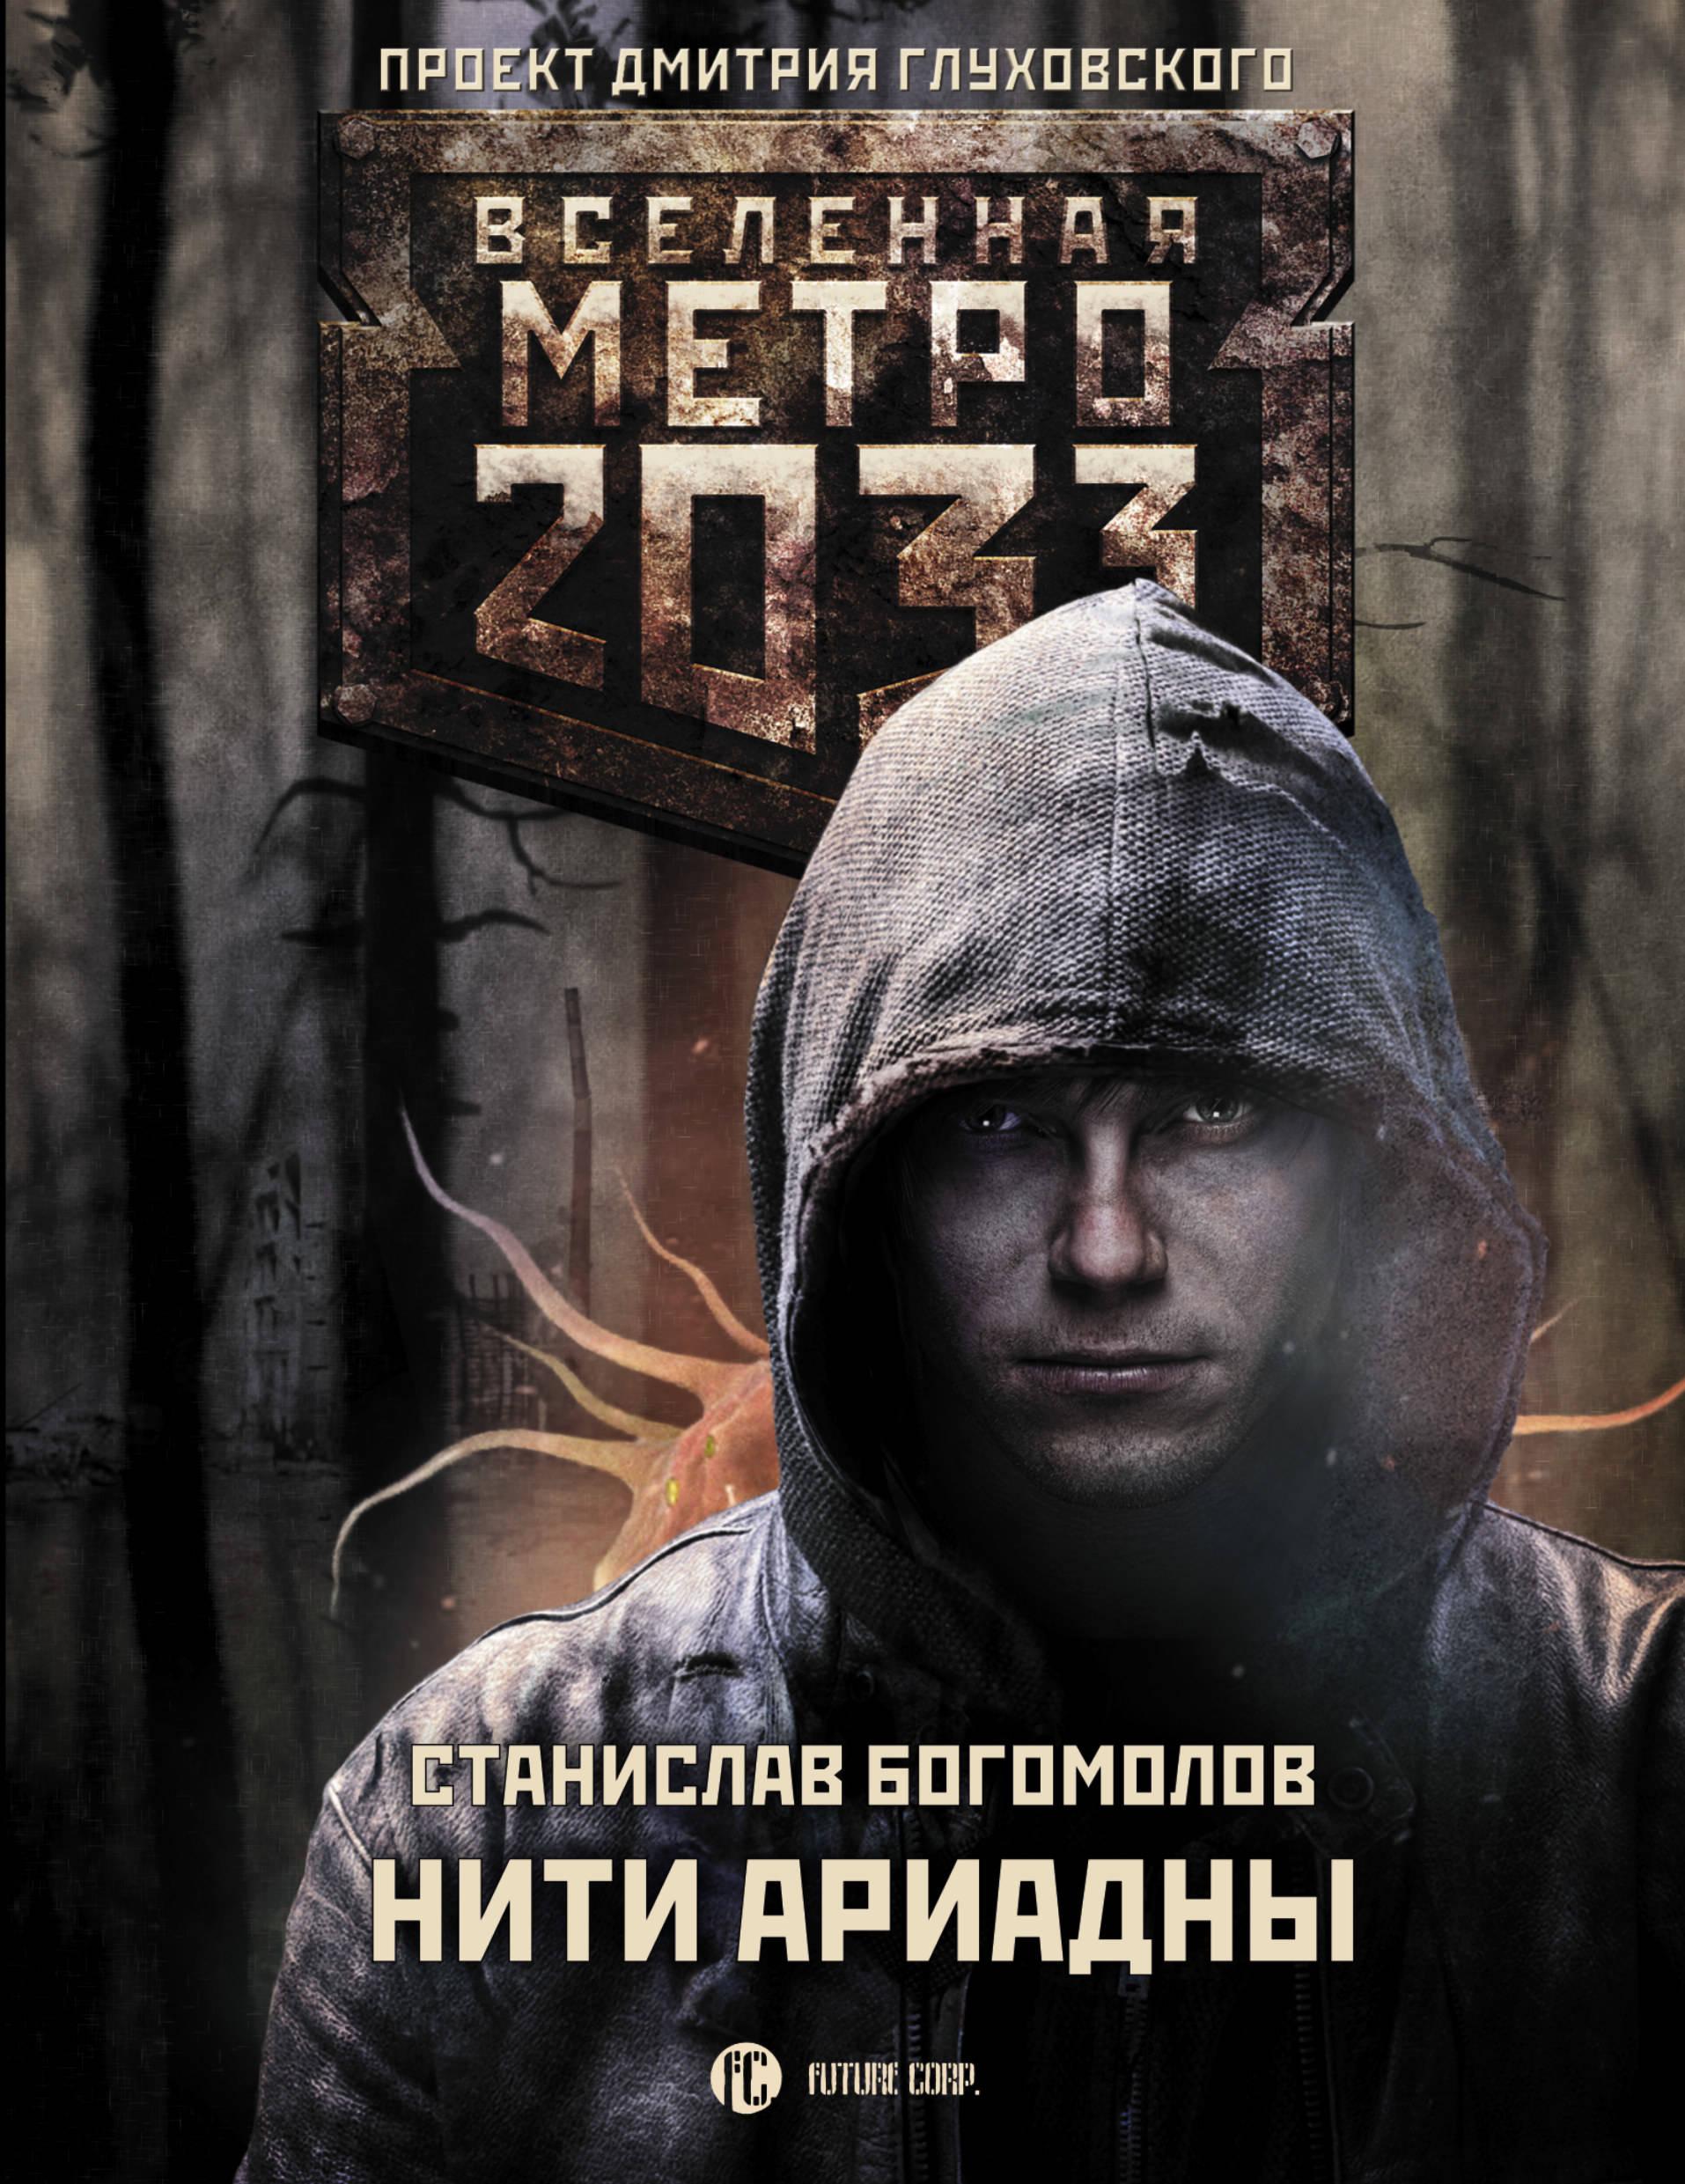 Станислав Богомолов. Метро 2033: Нити Ариадны